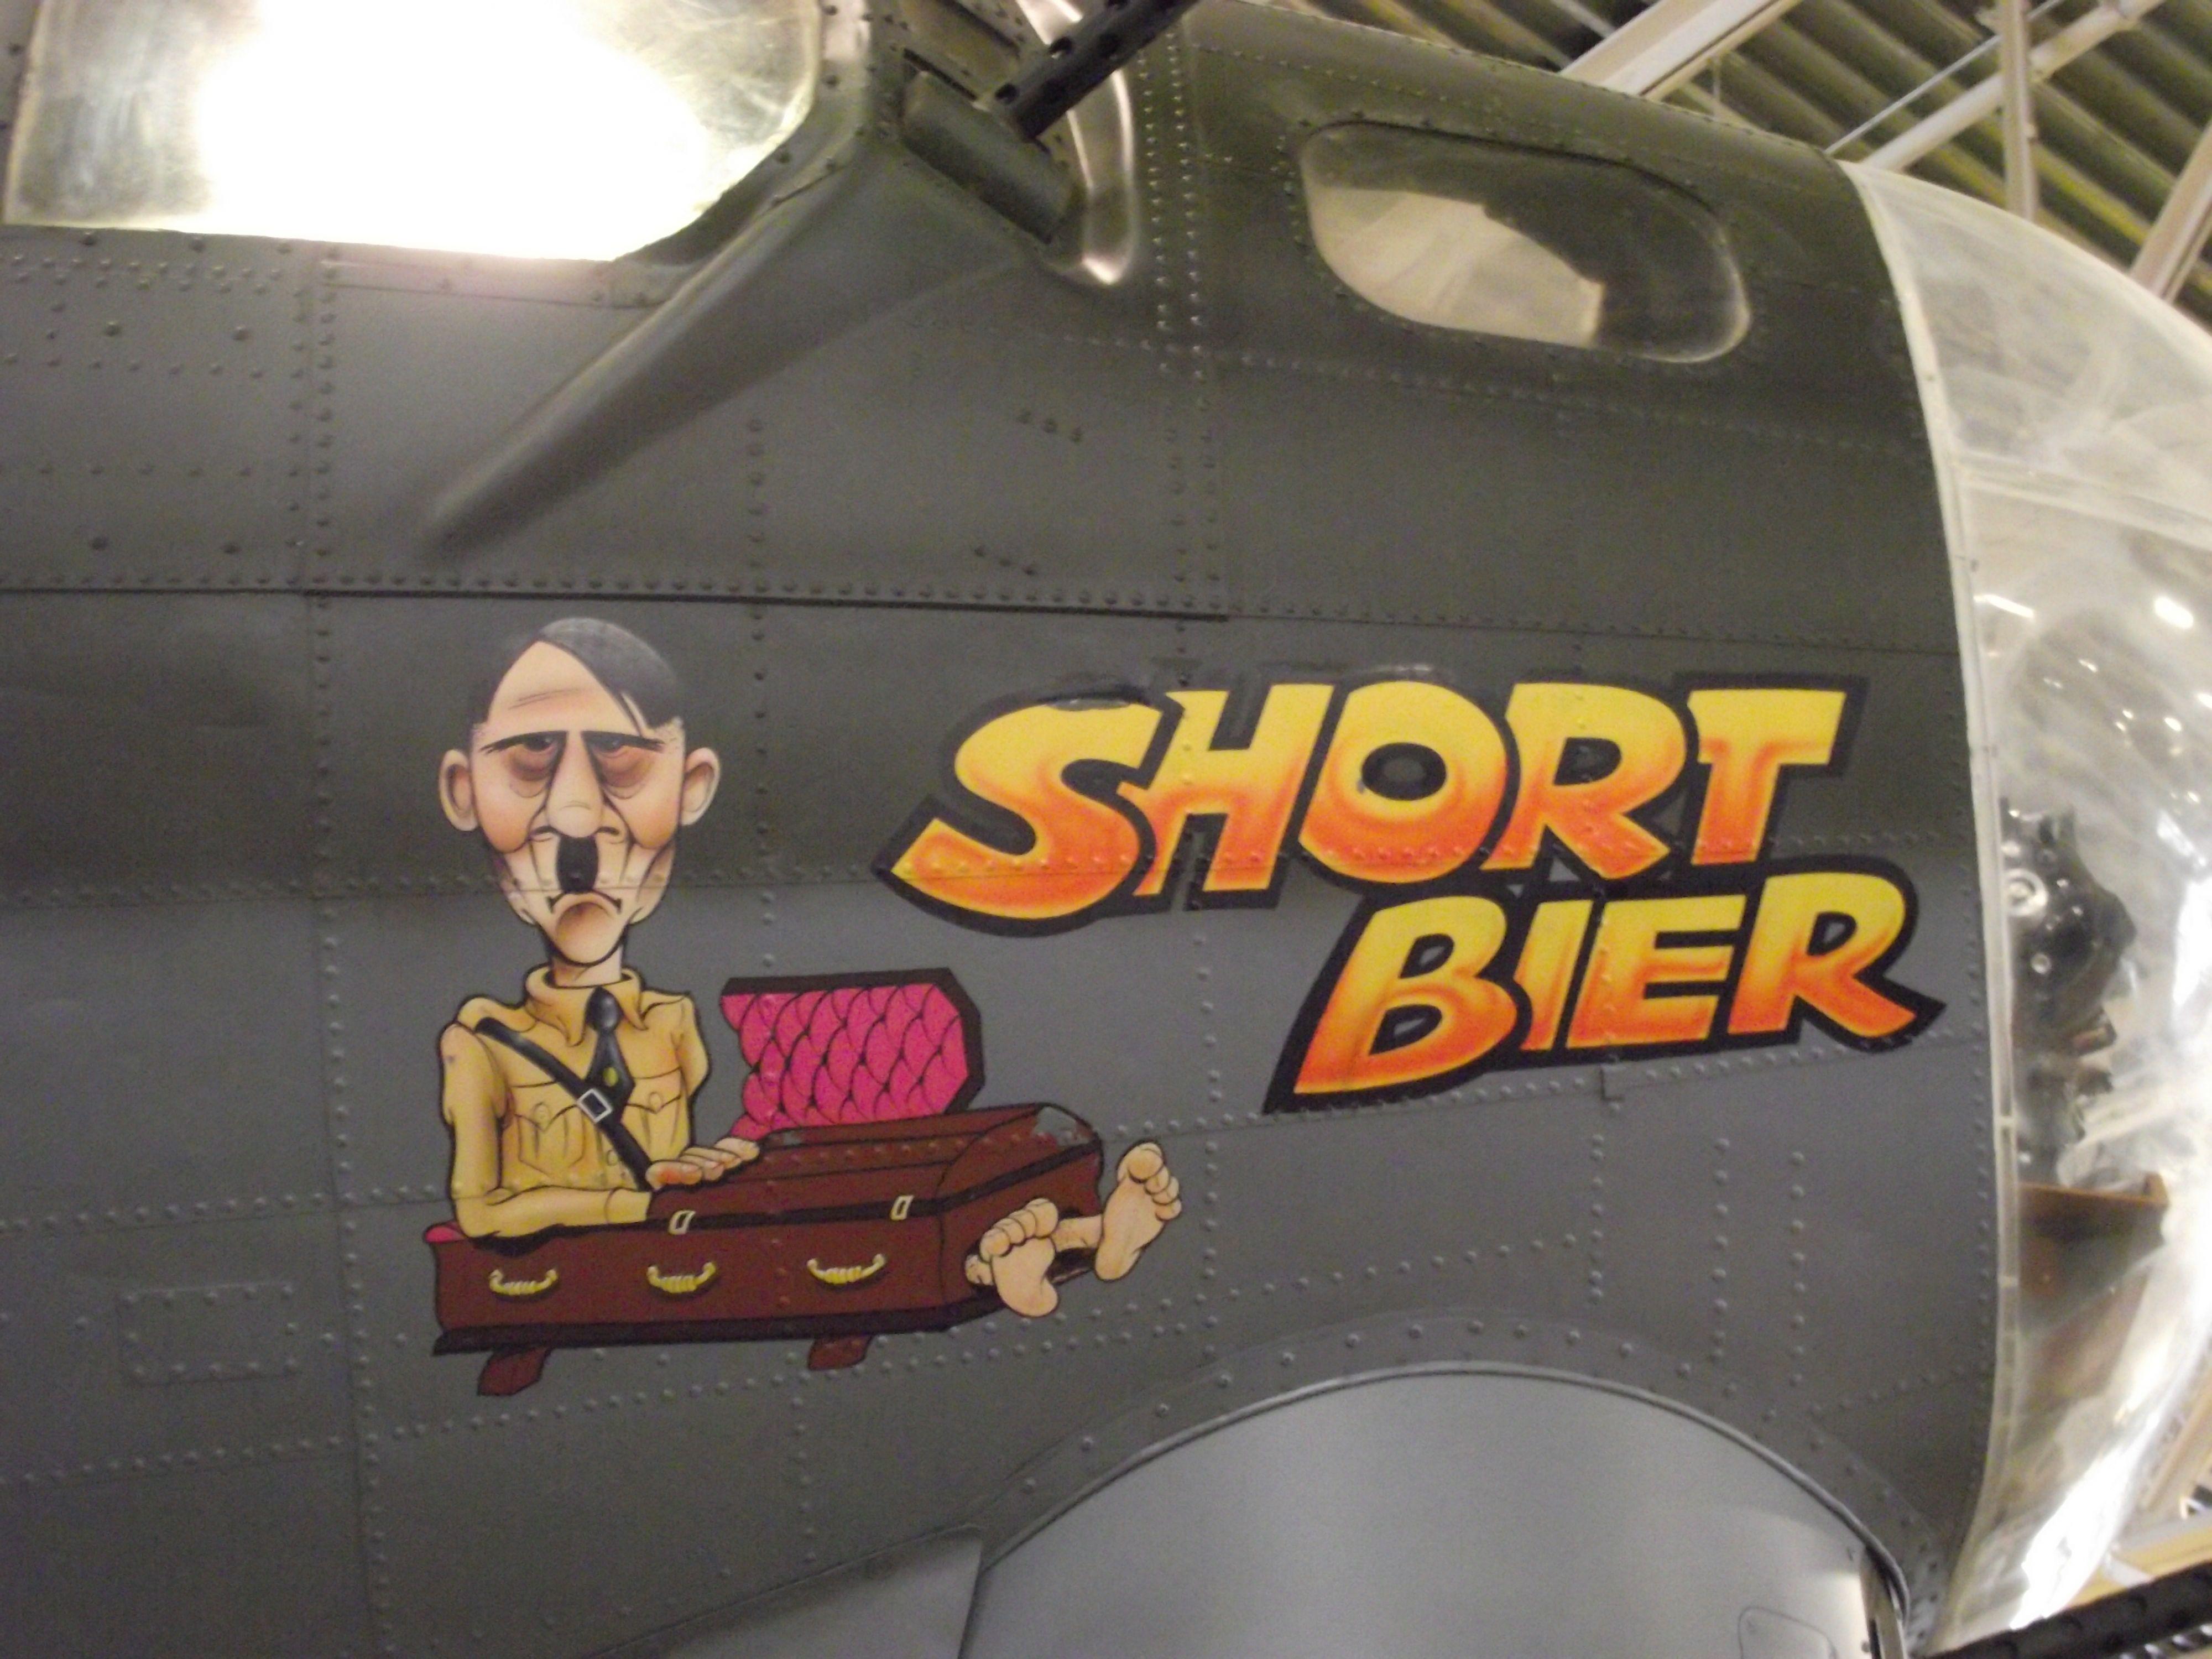 Short Bier, B17 Flying Fortress at Hill AFB Museum, Utah